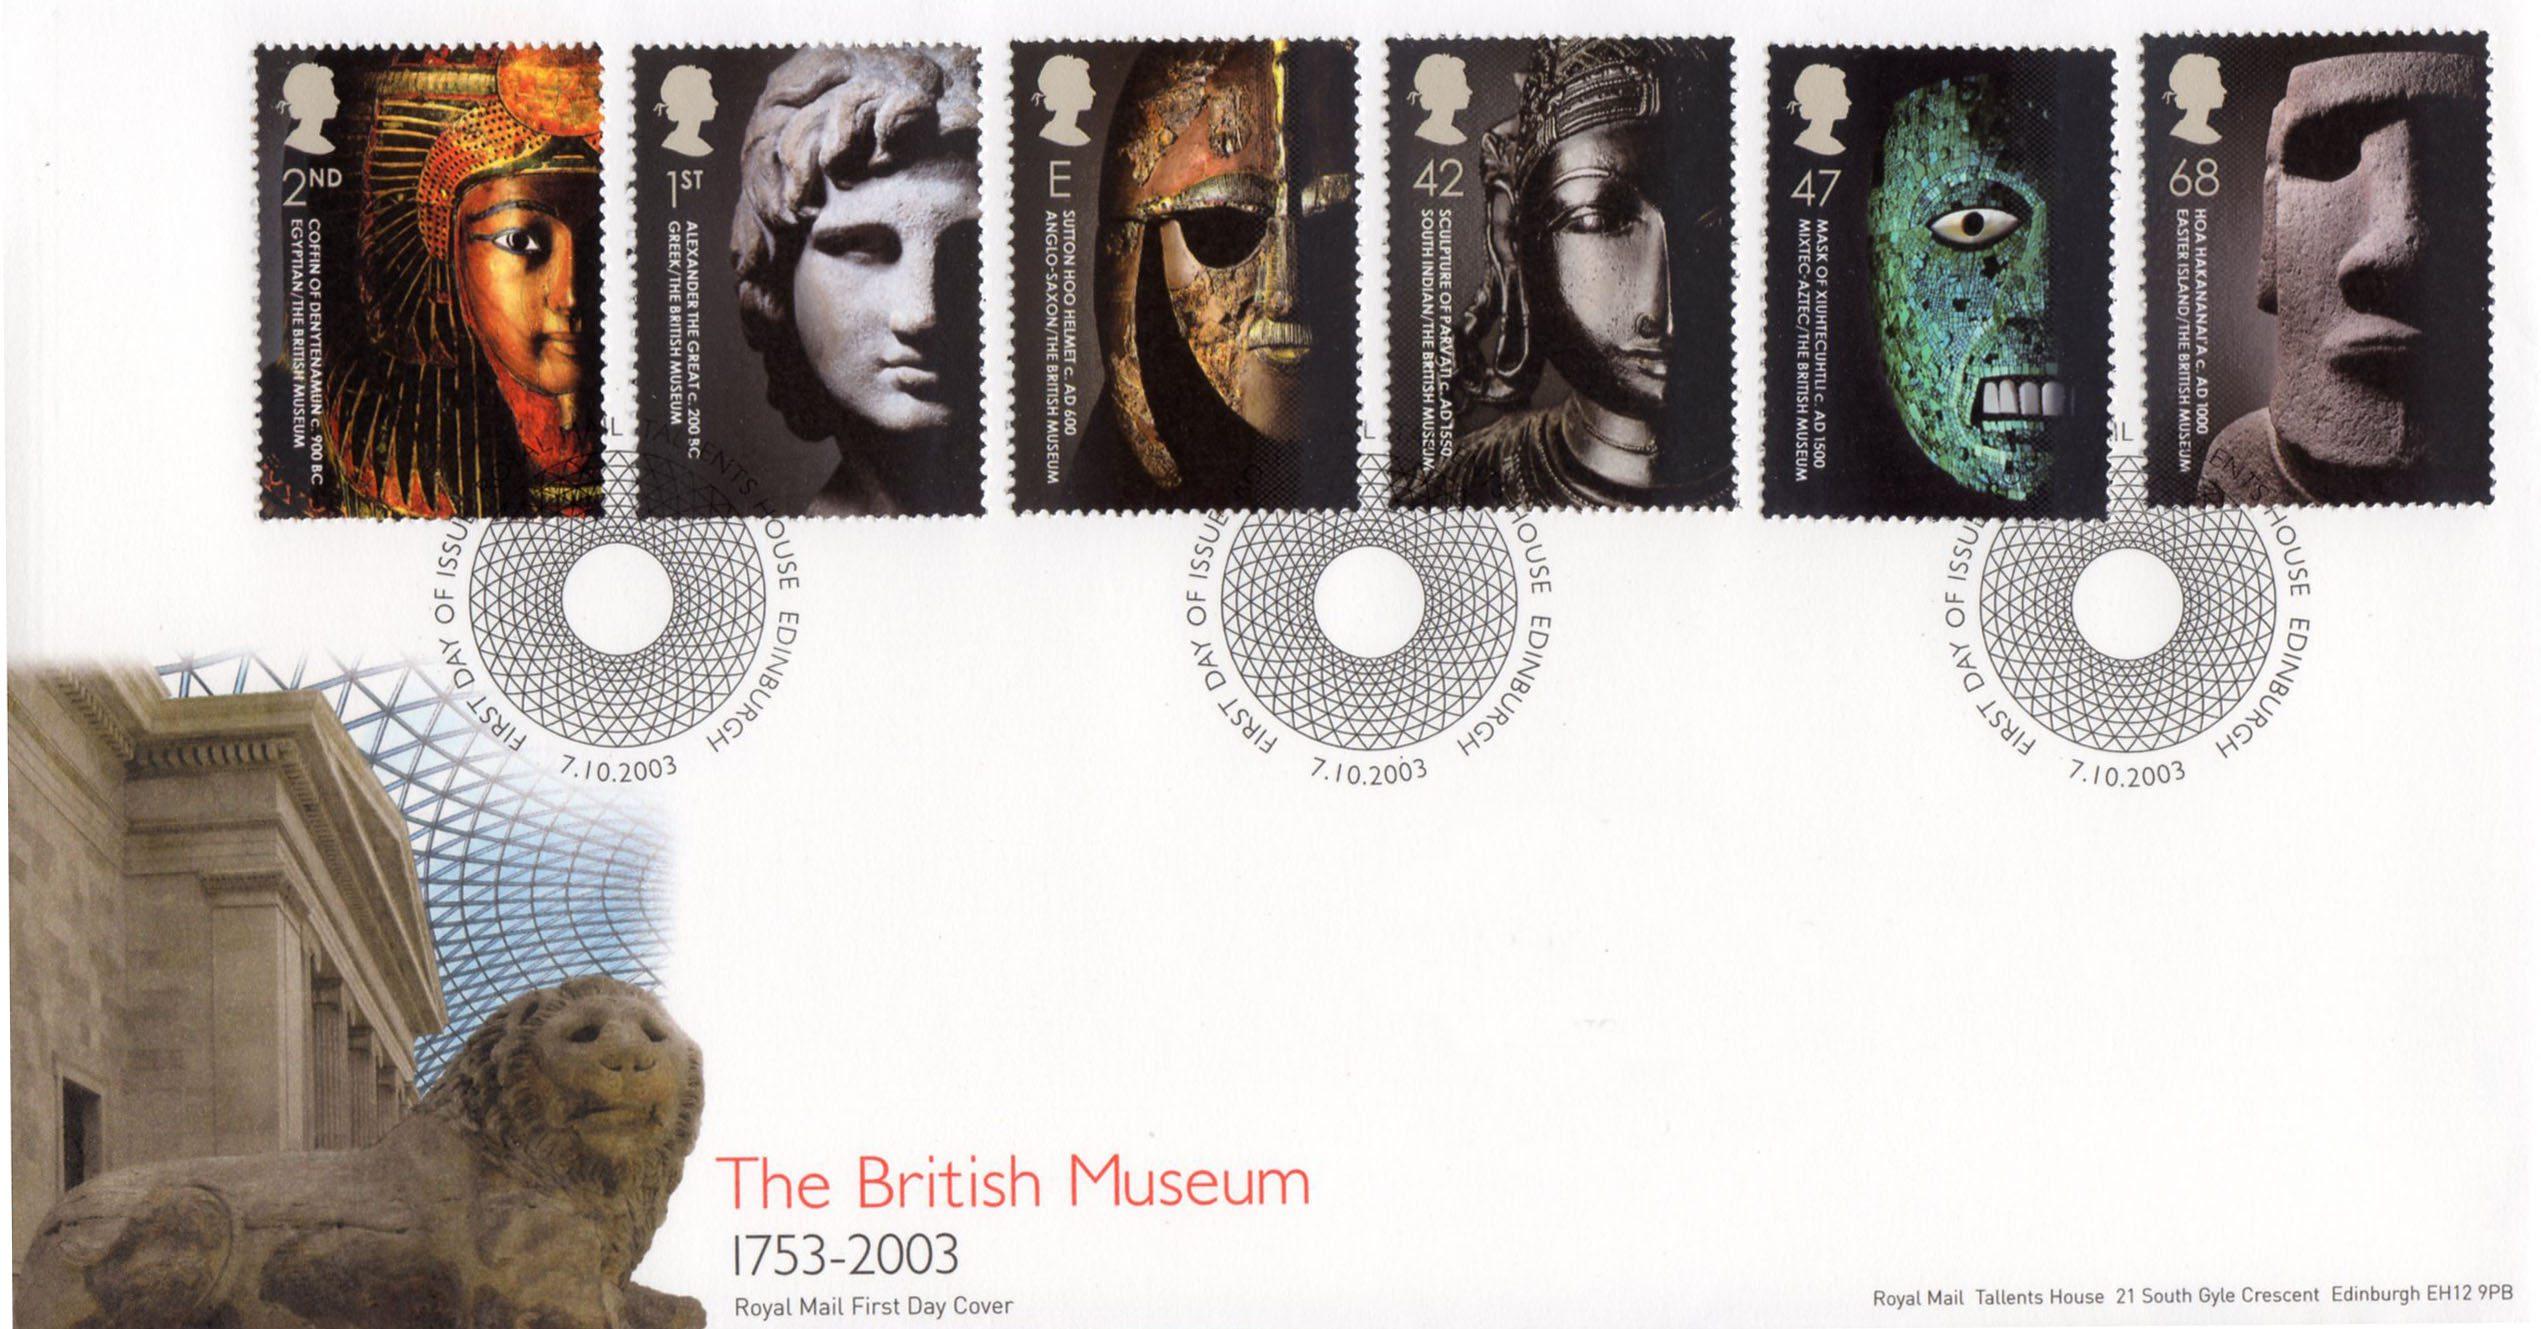 unused mint 2003 British Museum British stamp set 250 years masks Sutton Hoo AlexanderScan enlarged. collect GB craft art supply frame